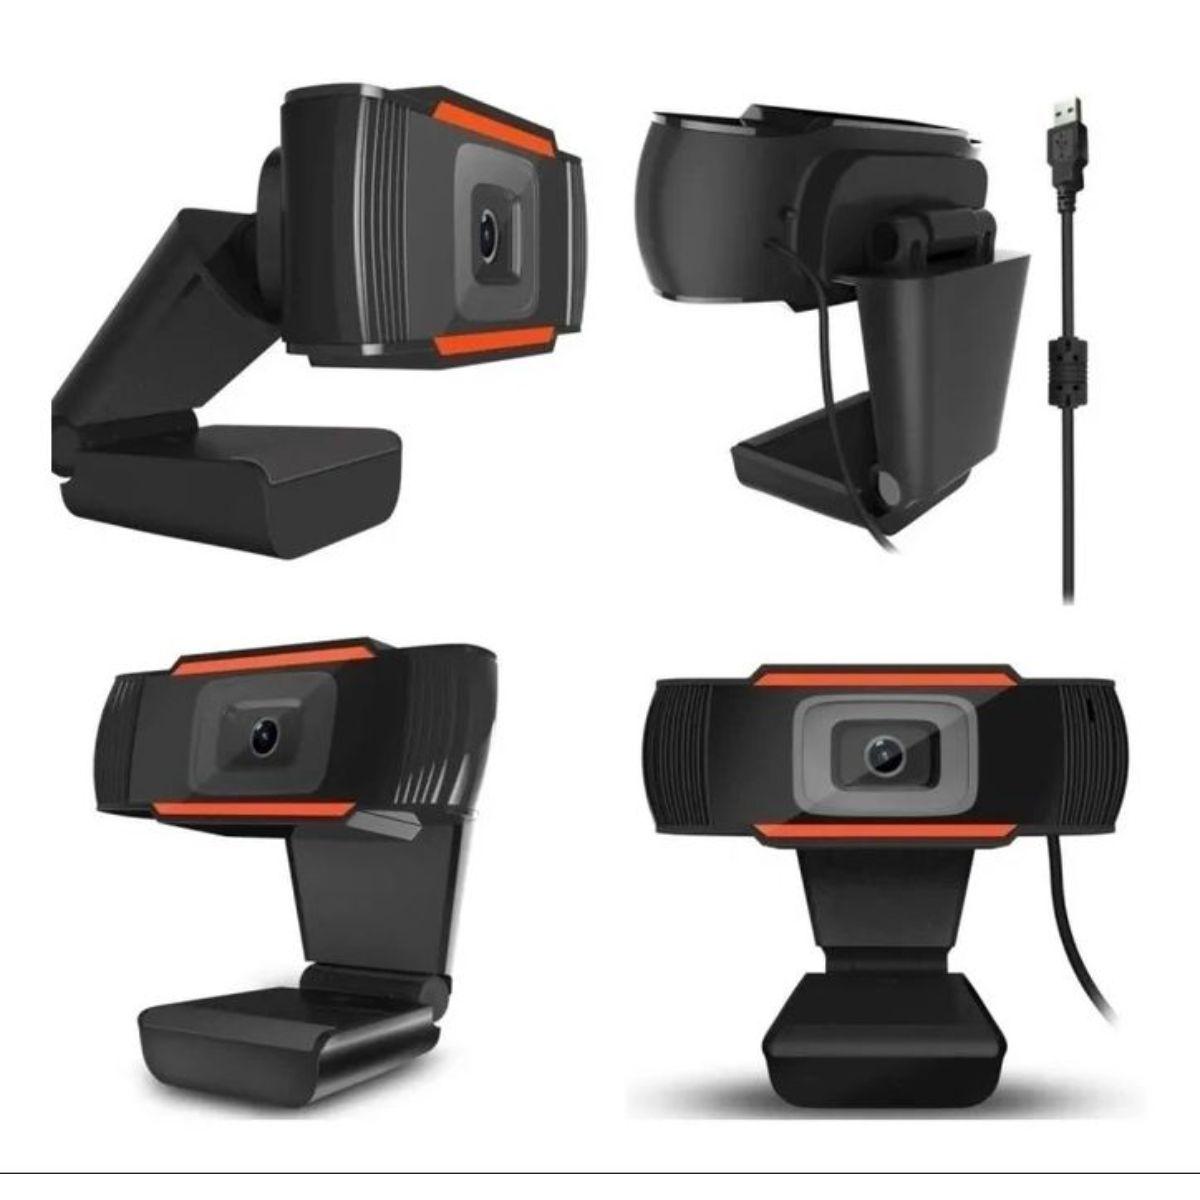 camara web 1080p usb para pc laptop web cam 1 1